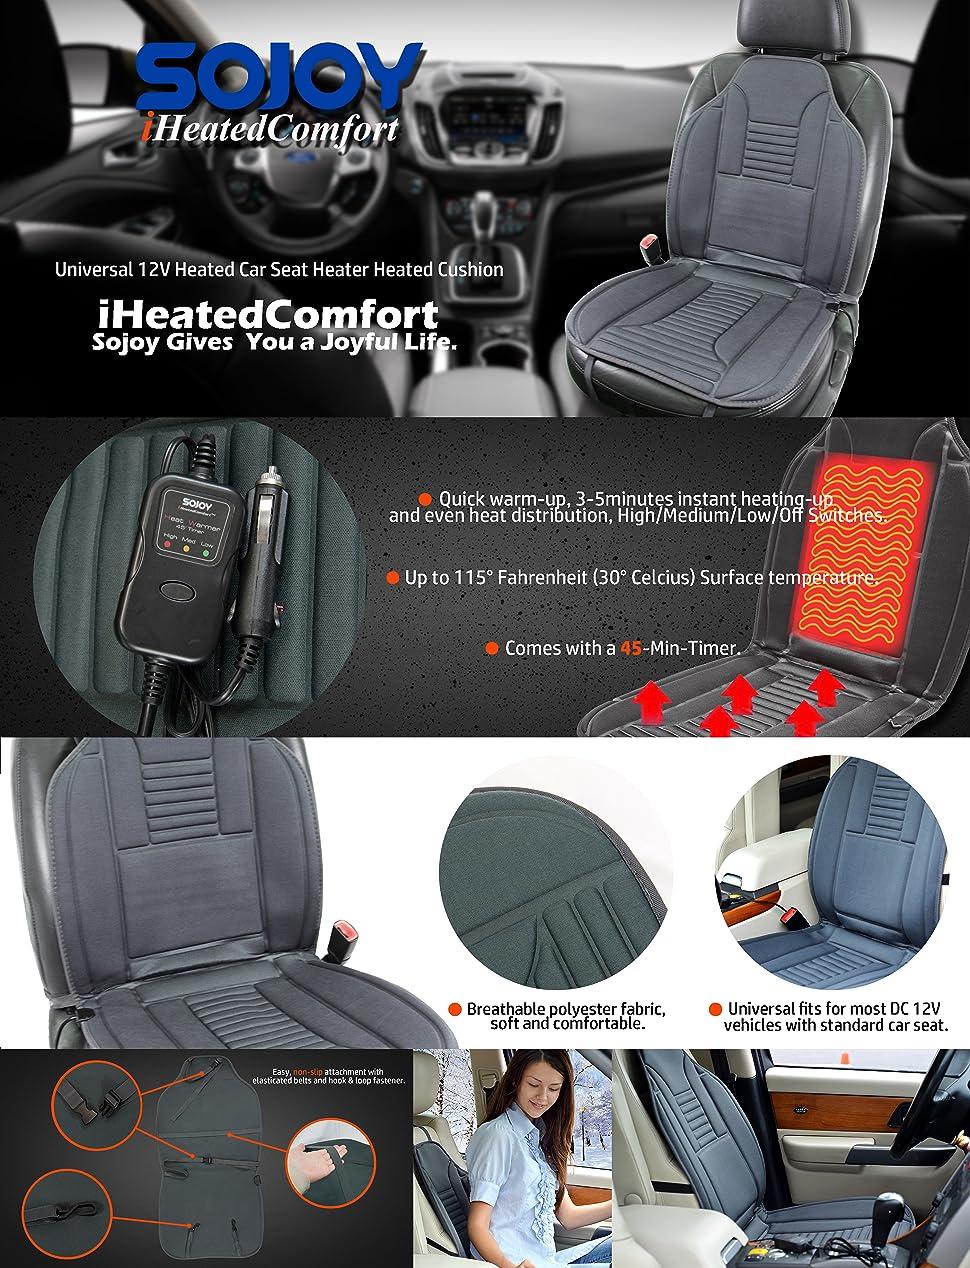 Amazon Sojoy Universal 12V Heated Car Seat Heater